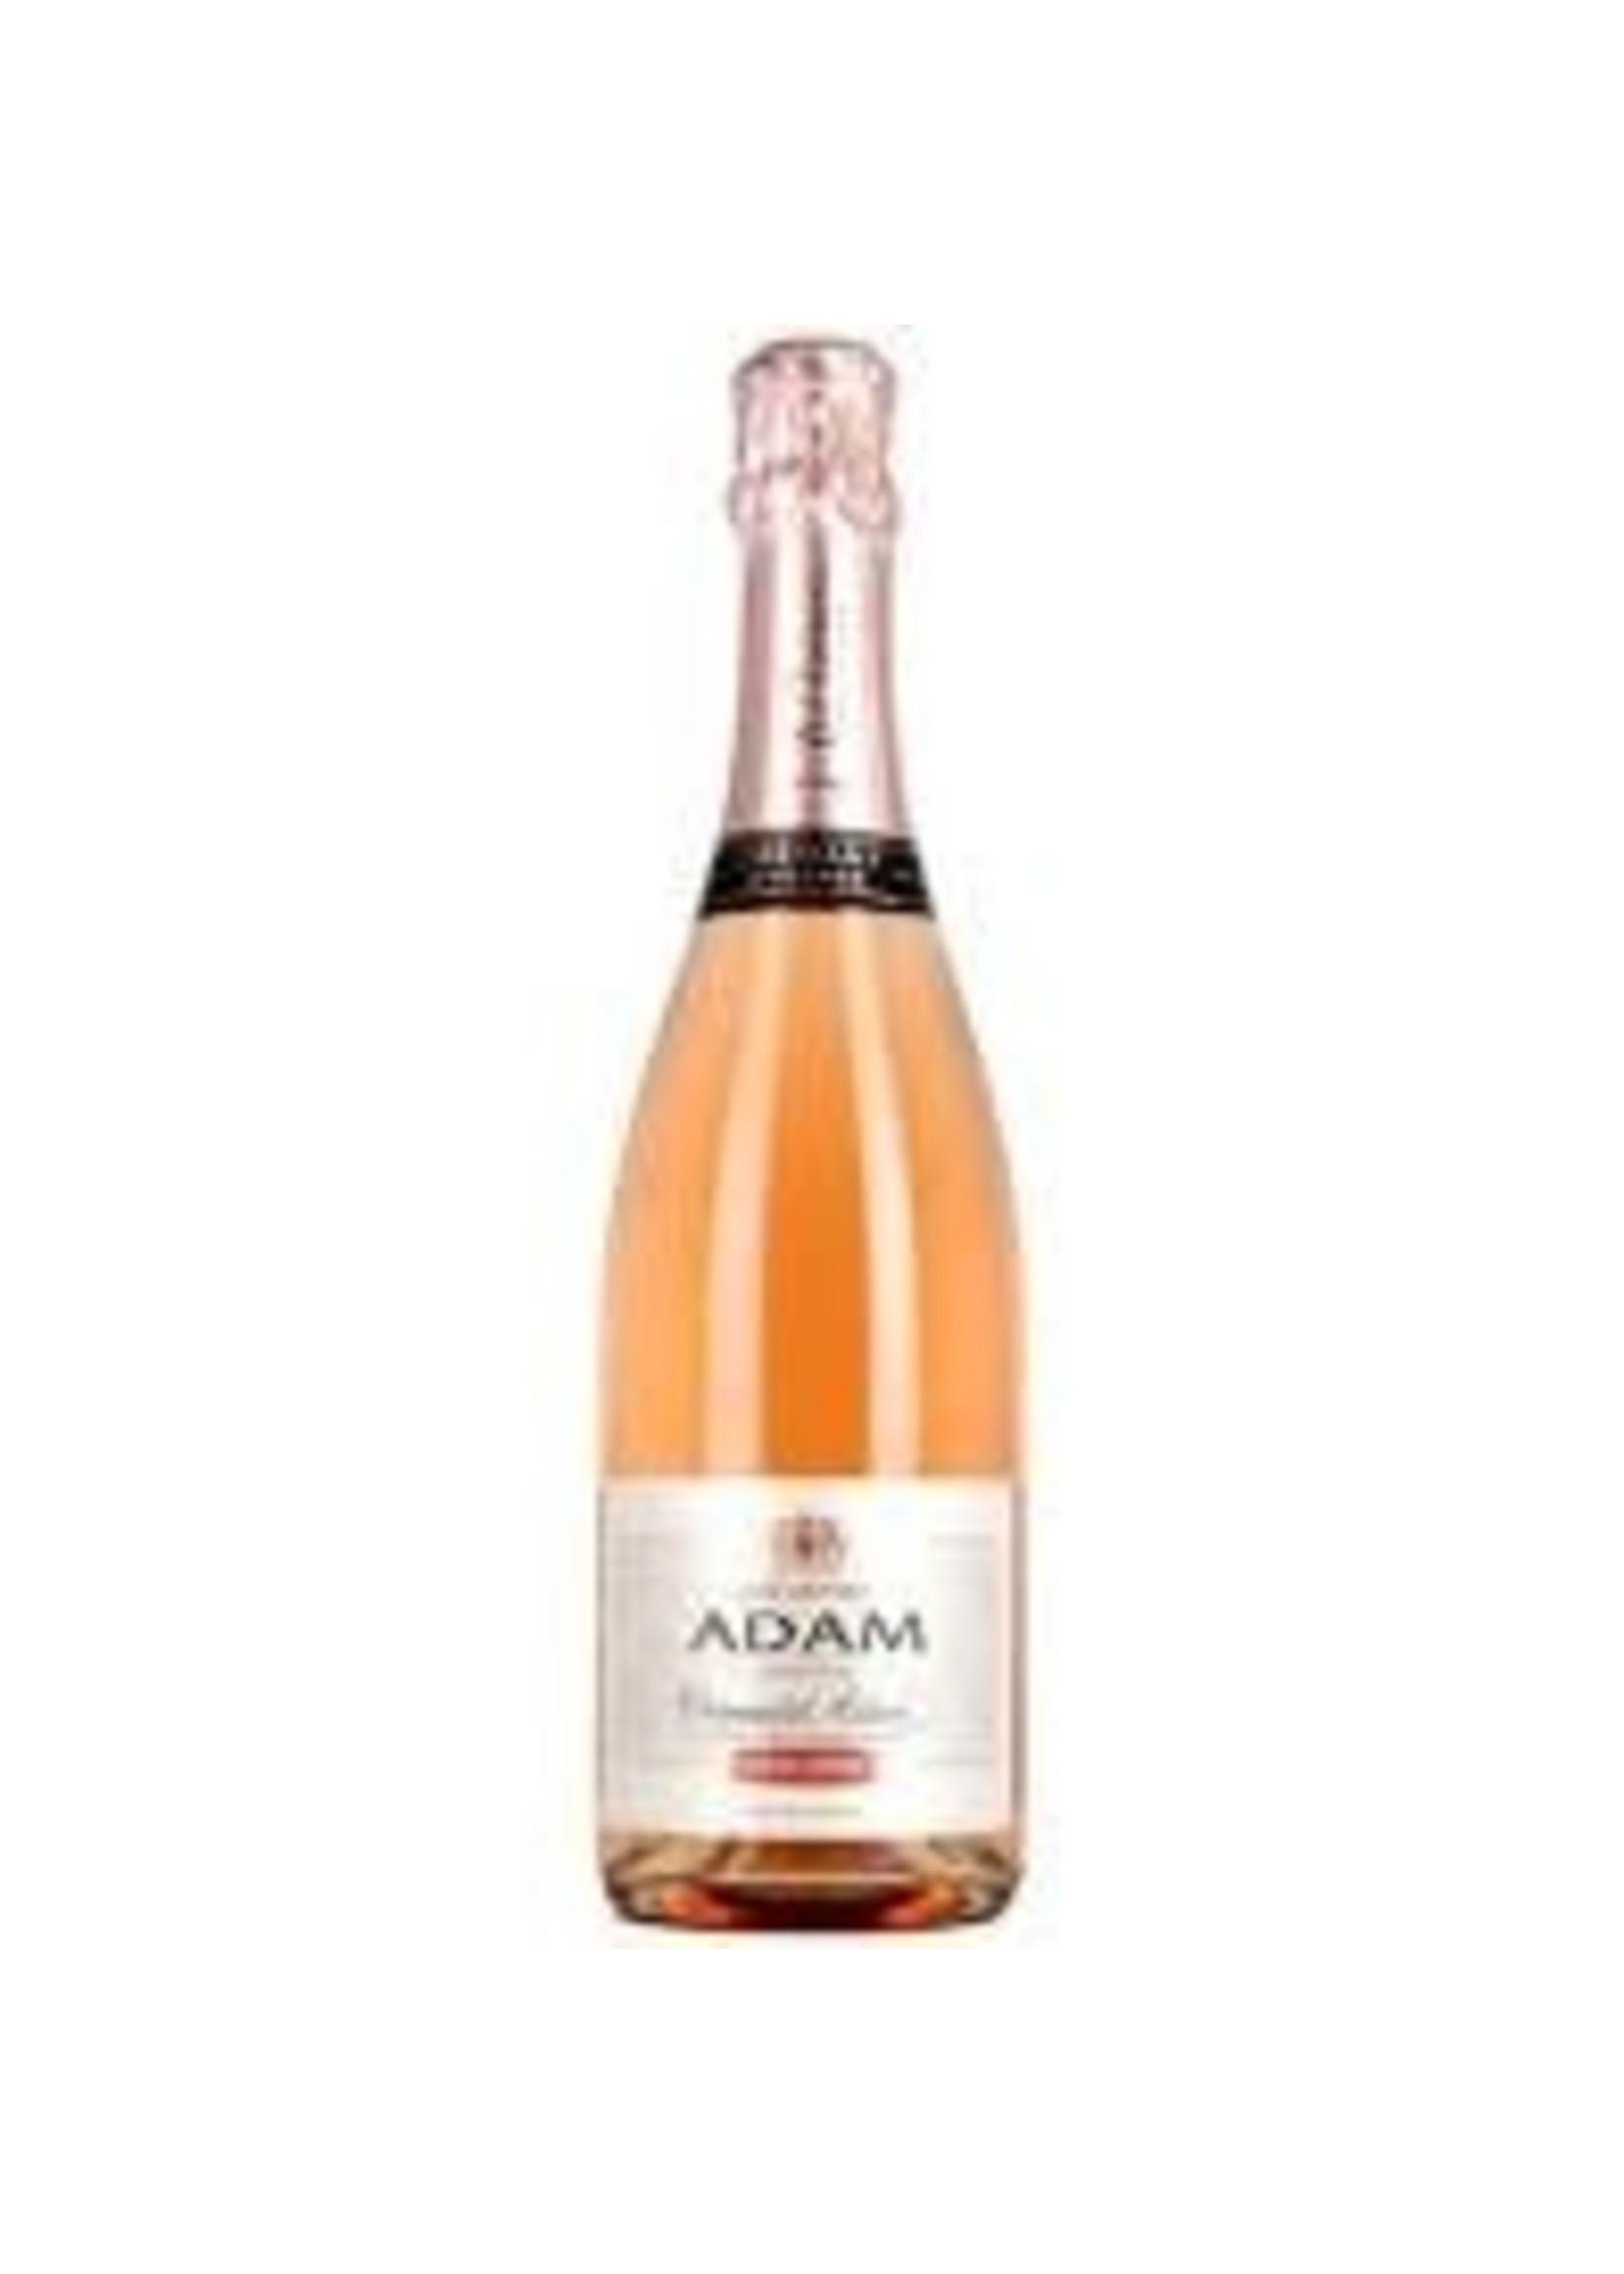 Jean Baptiste Adam NV Crement d'Alsace Brut Rose 750ml